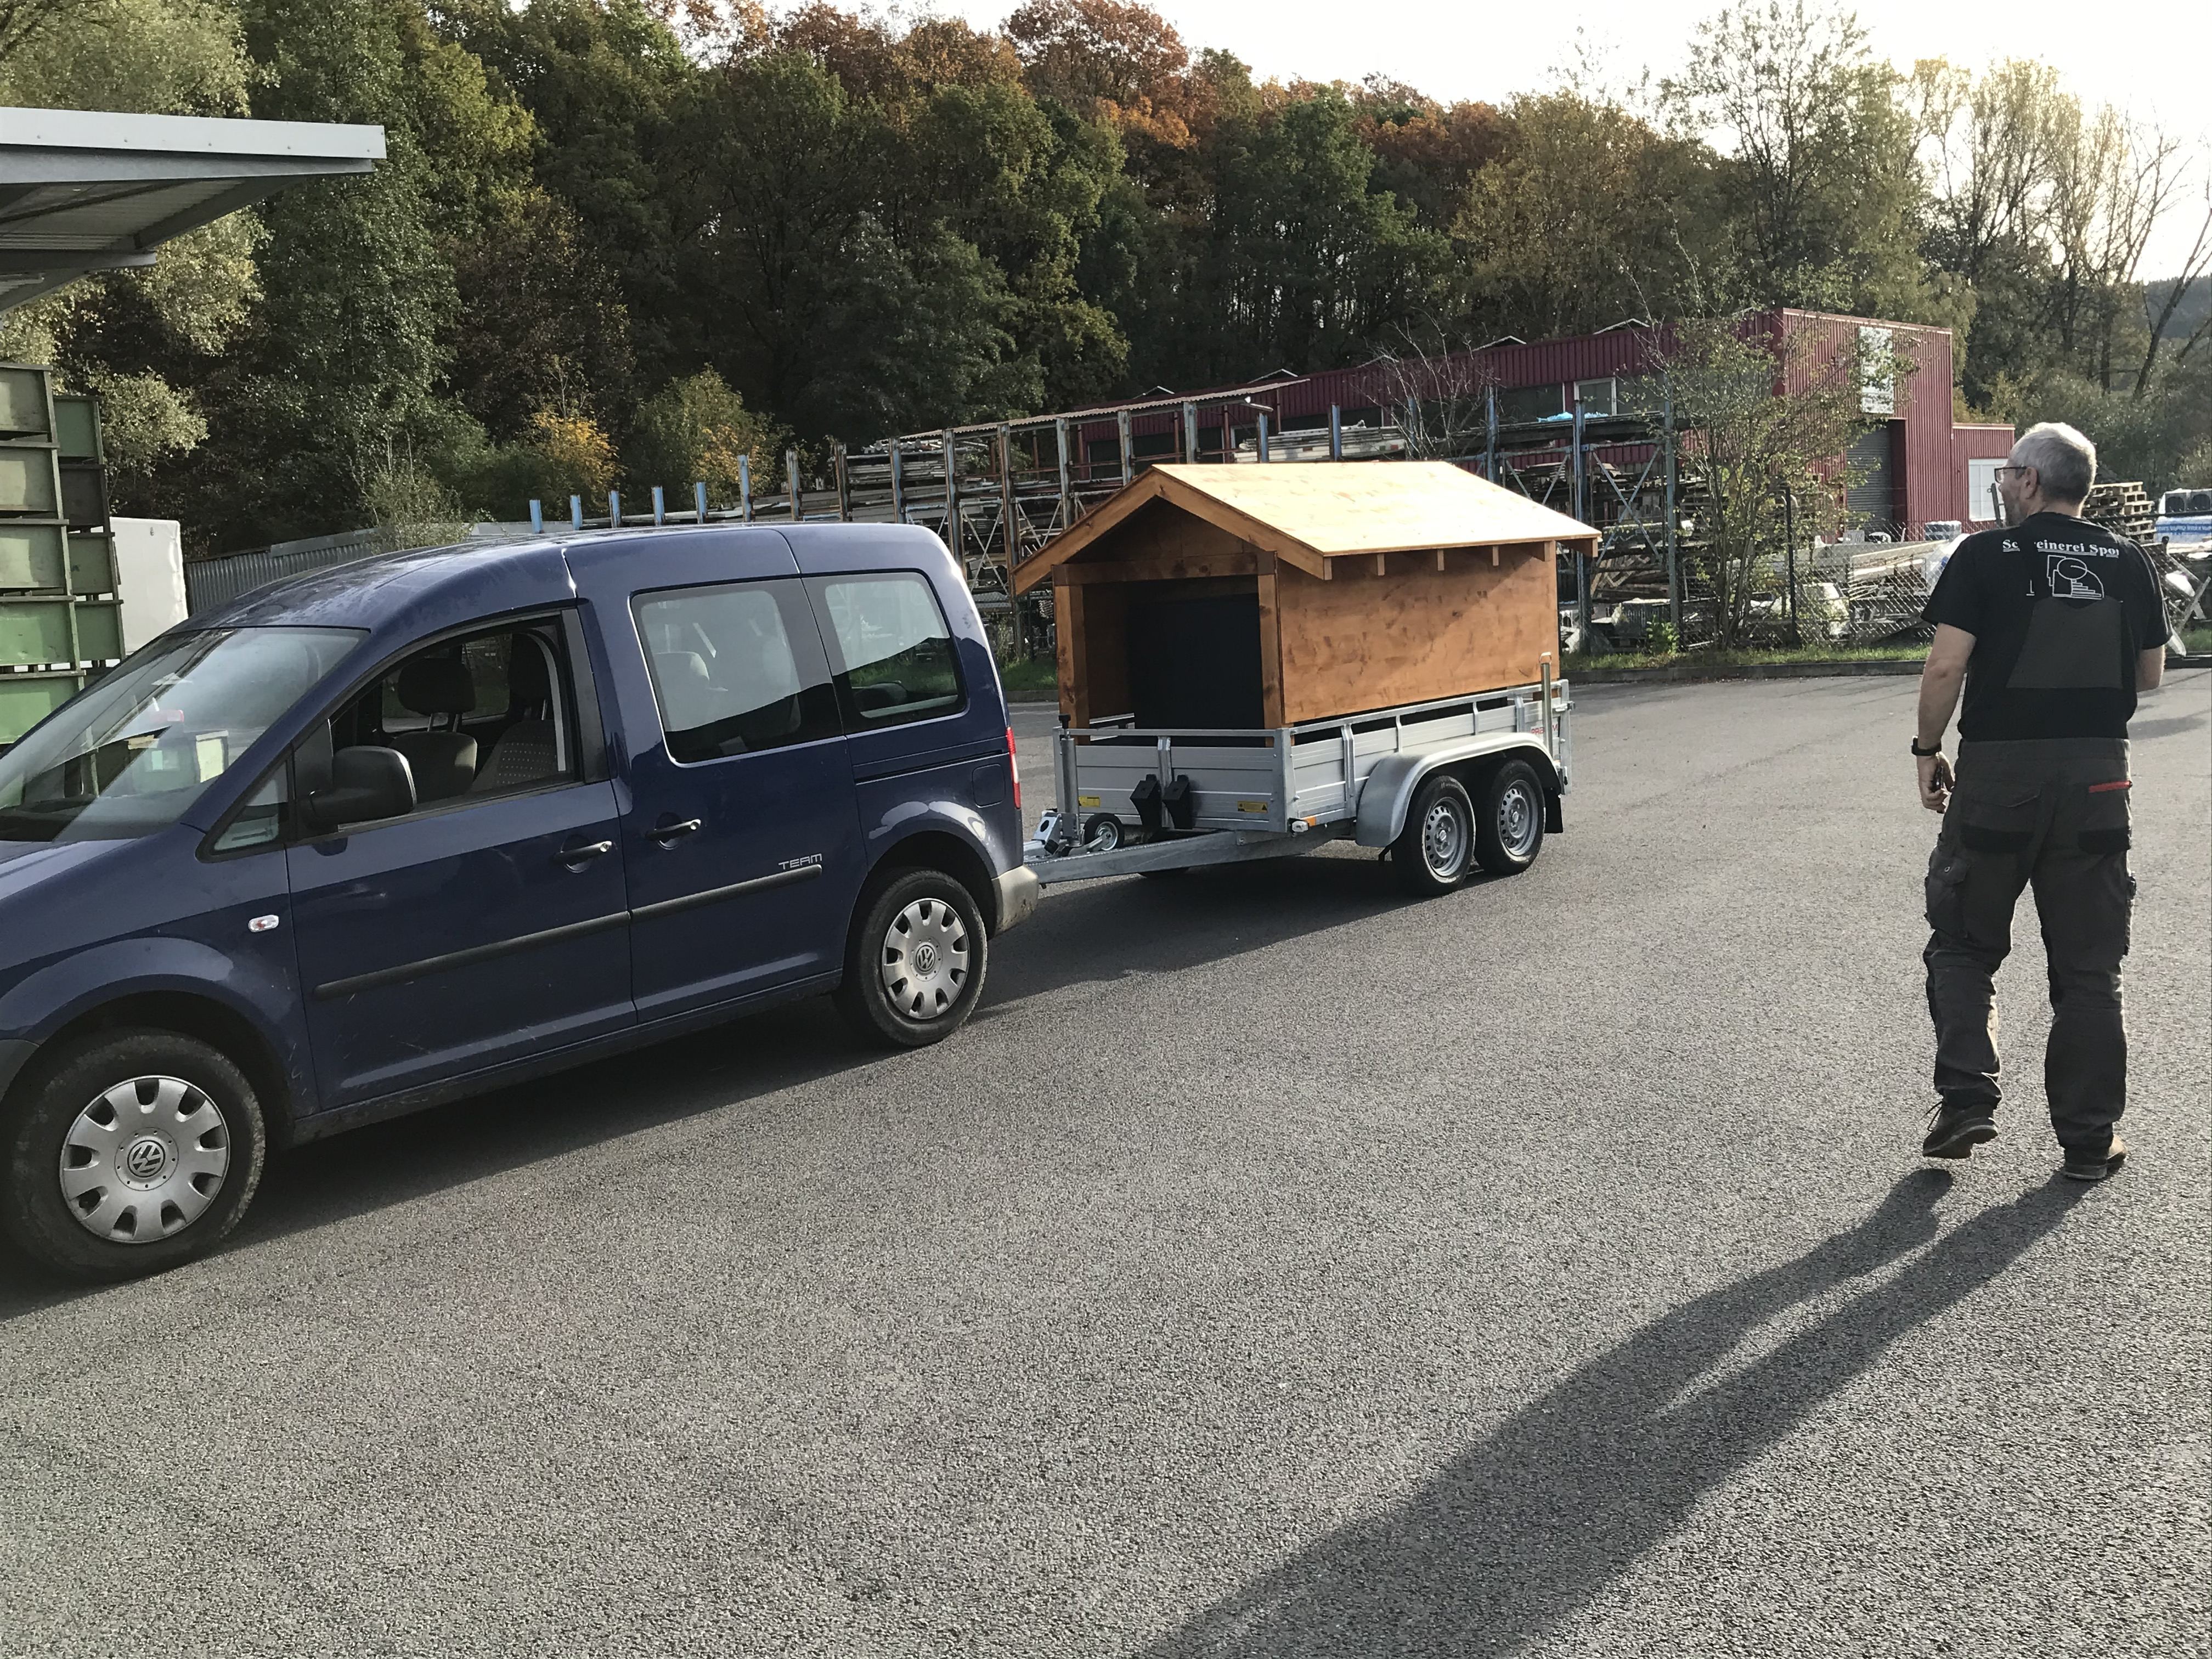 MB: Fahrzeug + MB + Anhänger_6